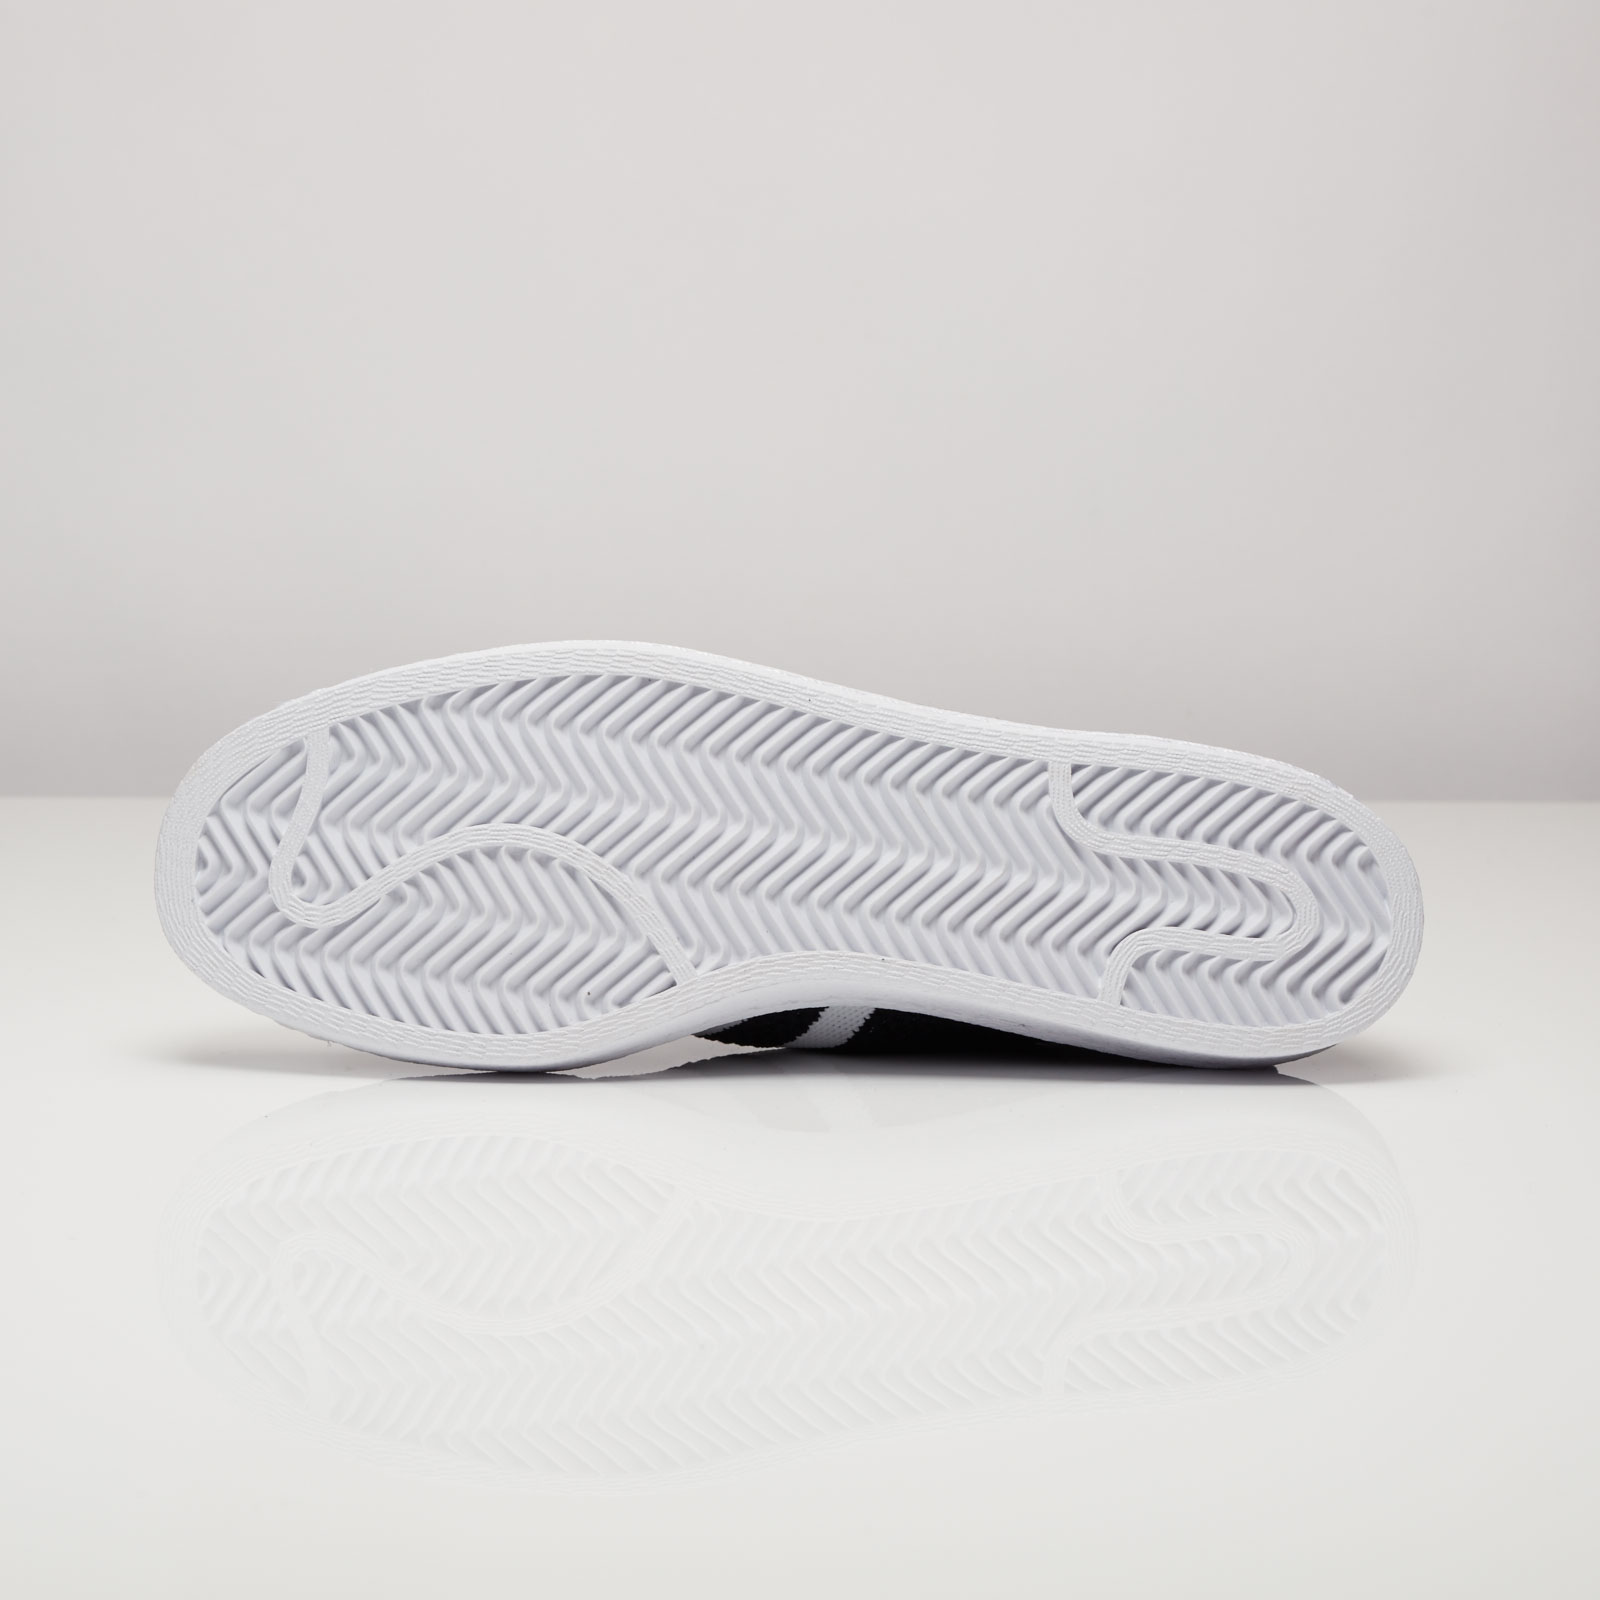 adidas Wmns Aq2881 Superstar 80s PK Aq2881 Wmns Sneakersnstuff | sneakers b8e470